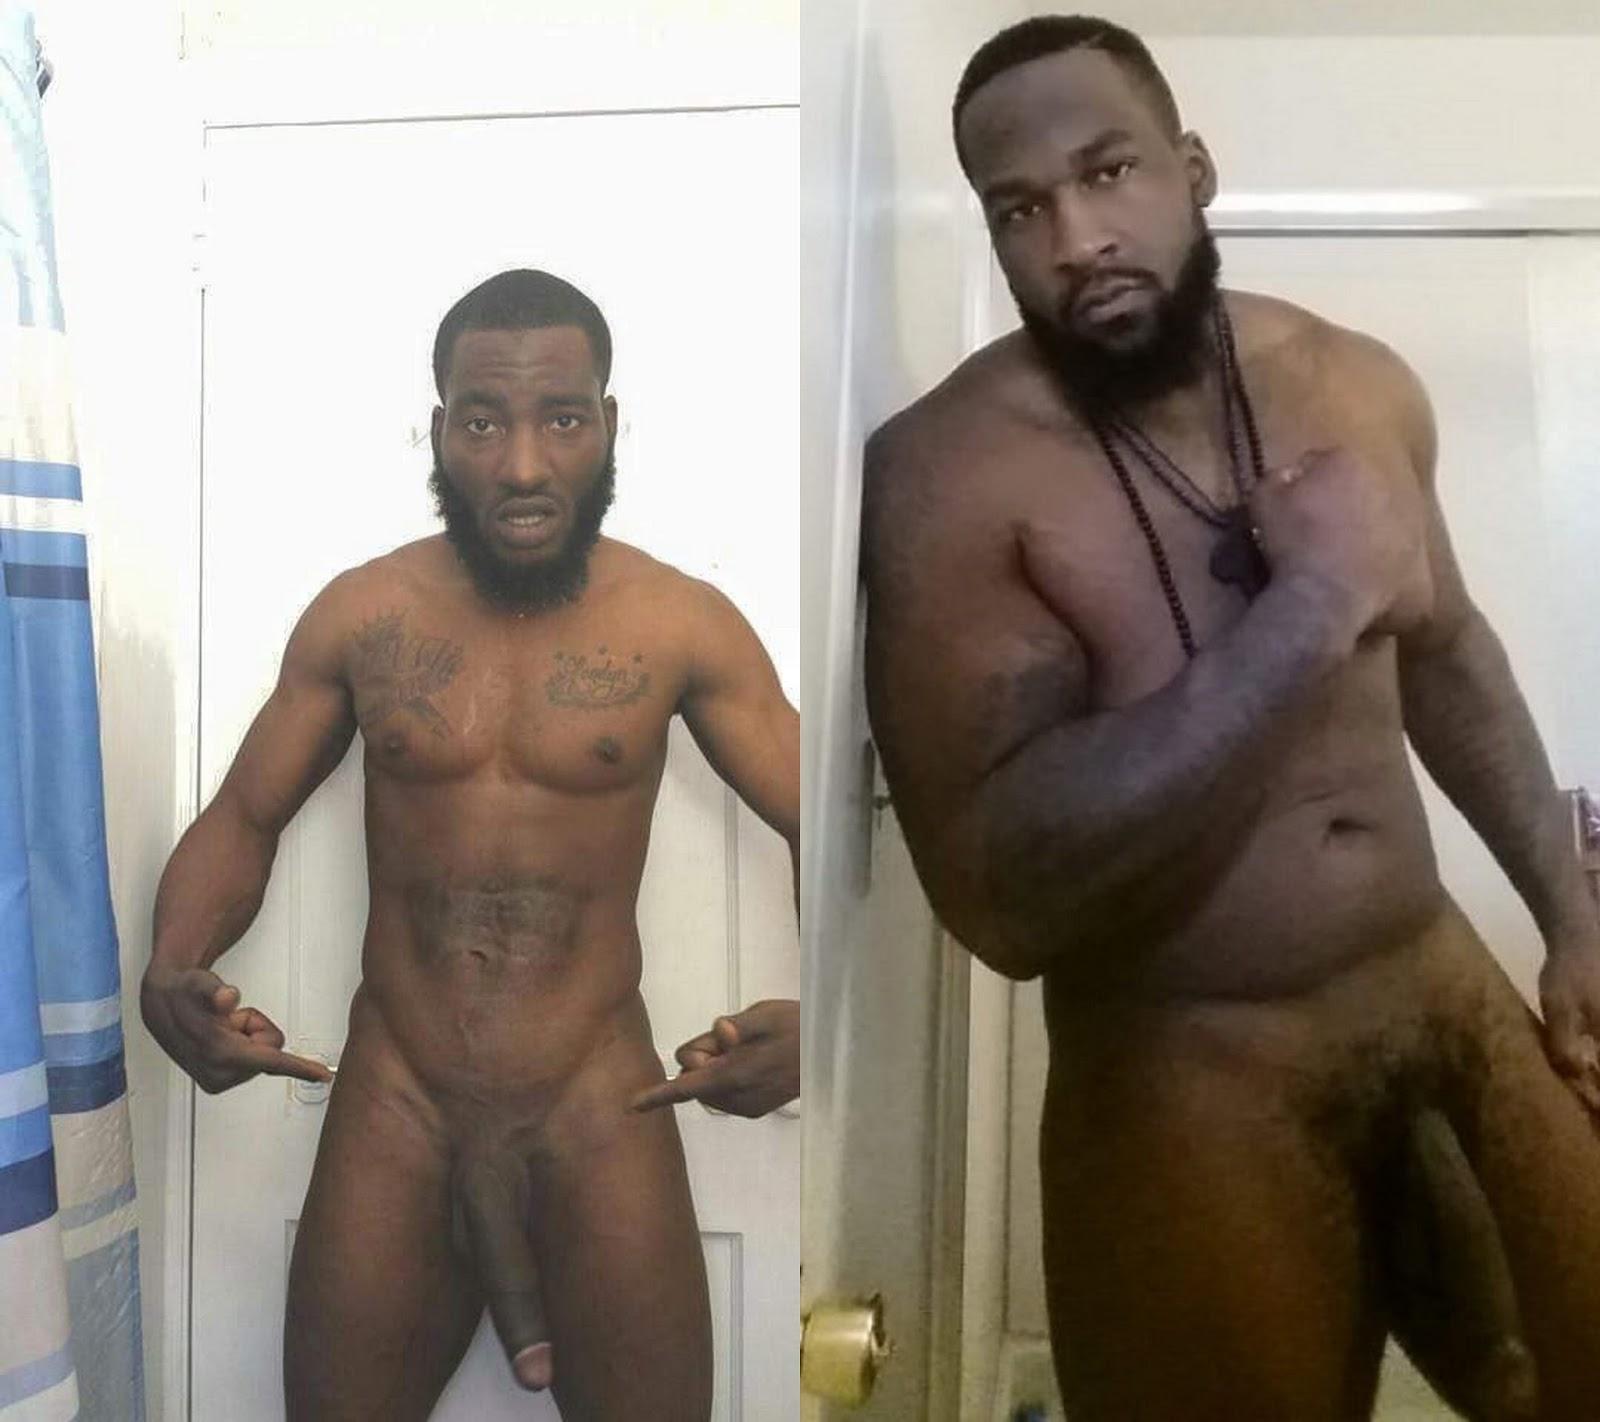 gigante gay peludo